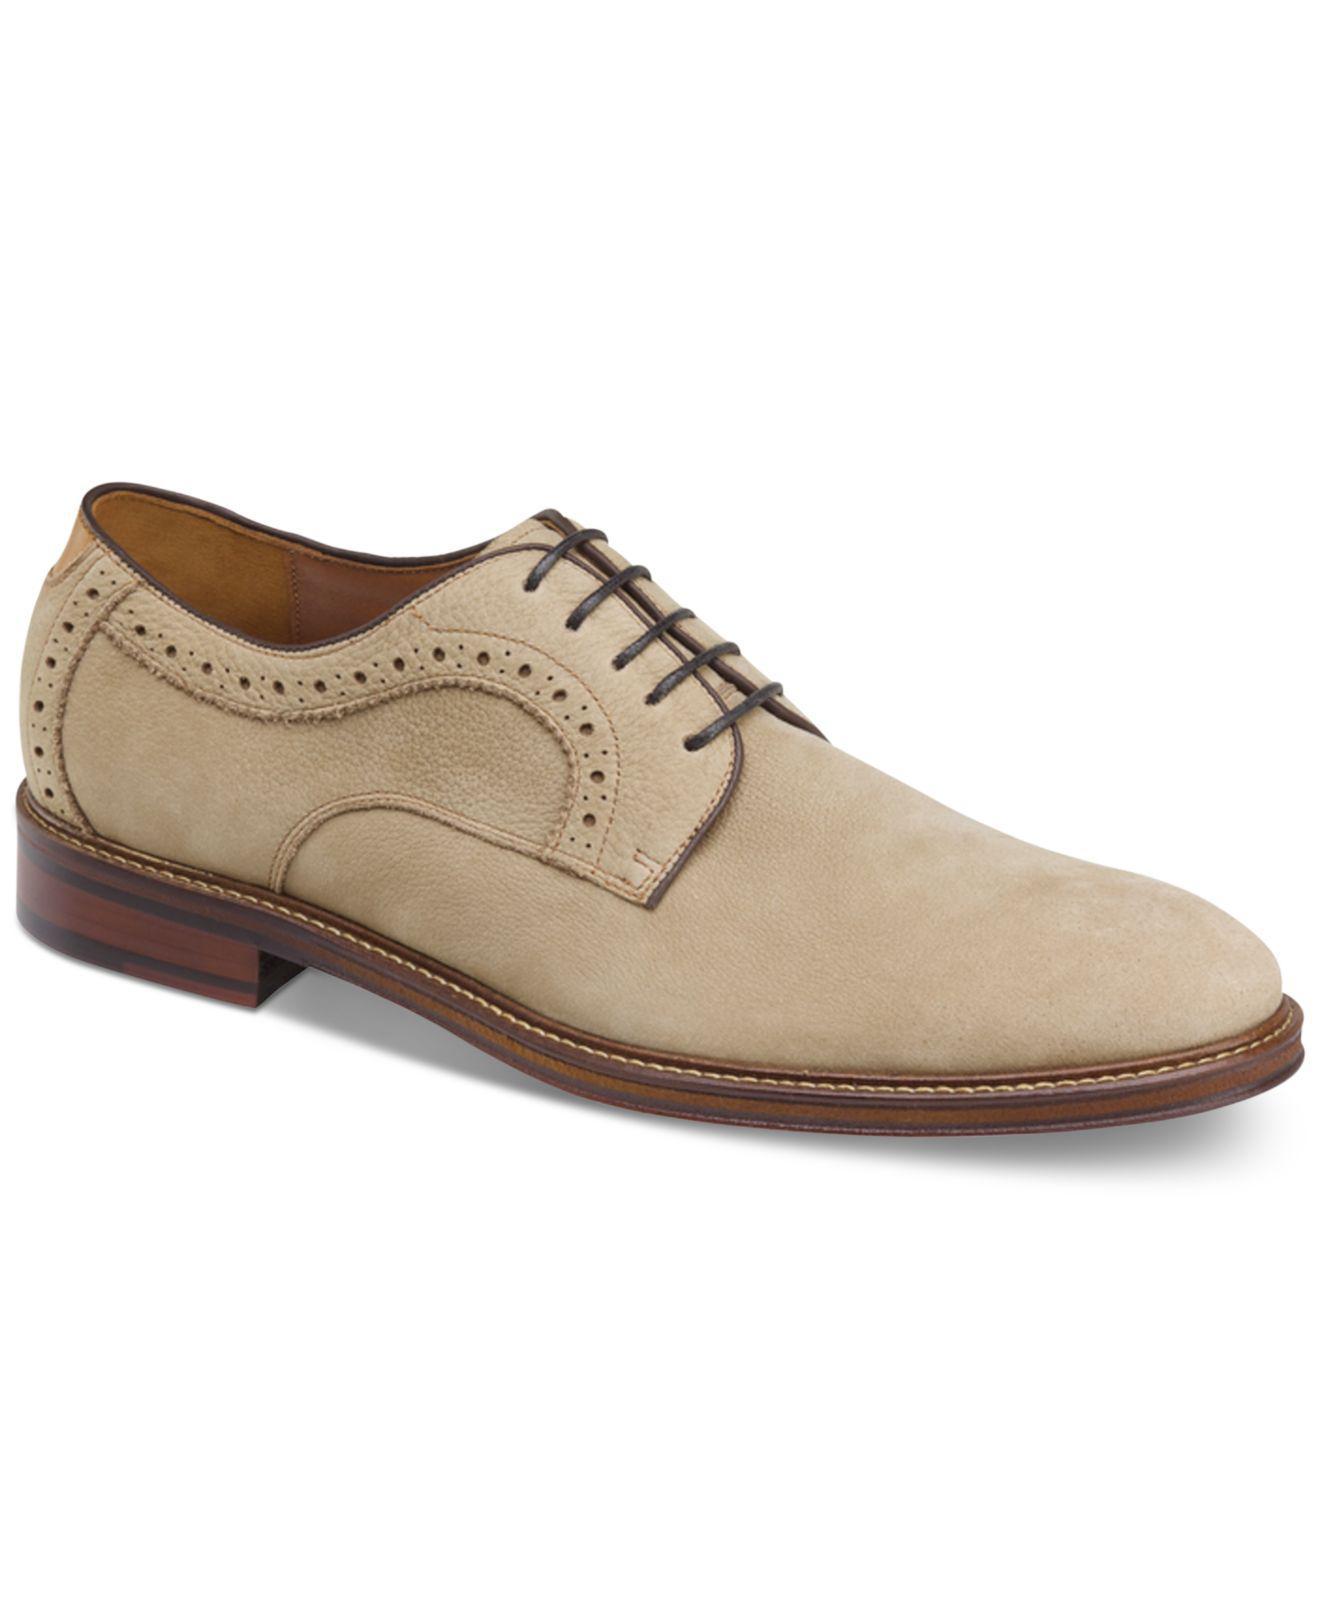 Johnston & Murphy Men's Warner Plain-Toe Lace-Up Oxfords Men's Shoes GzZYSK2v56